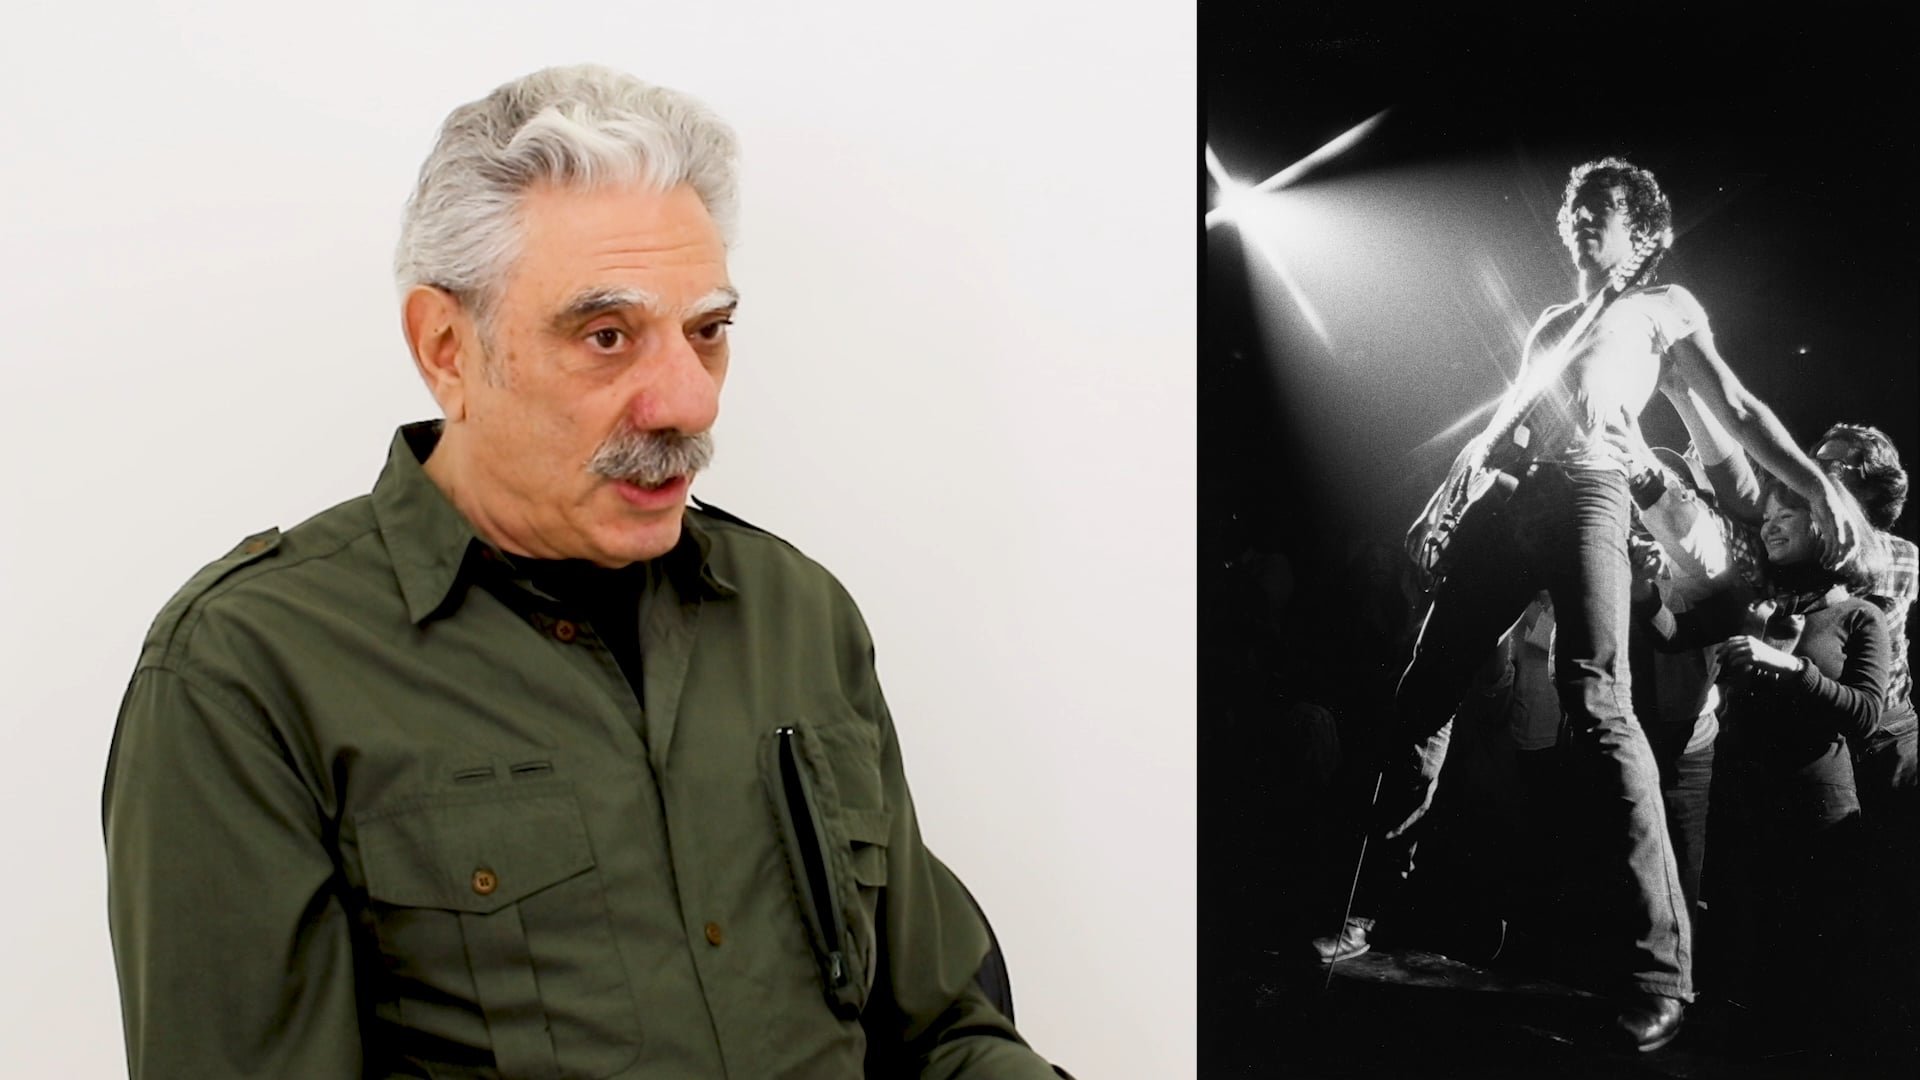 Photographer Allan Tannenbaum discusses Bruce Springsteen